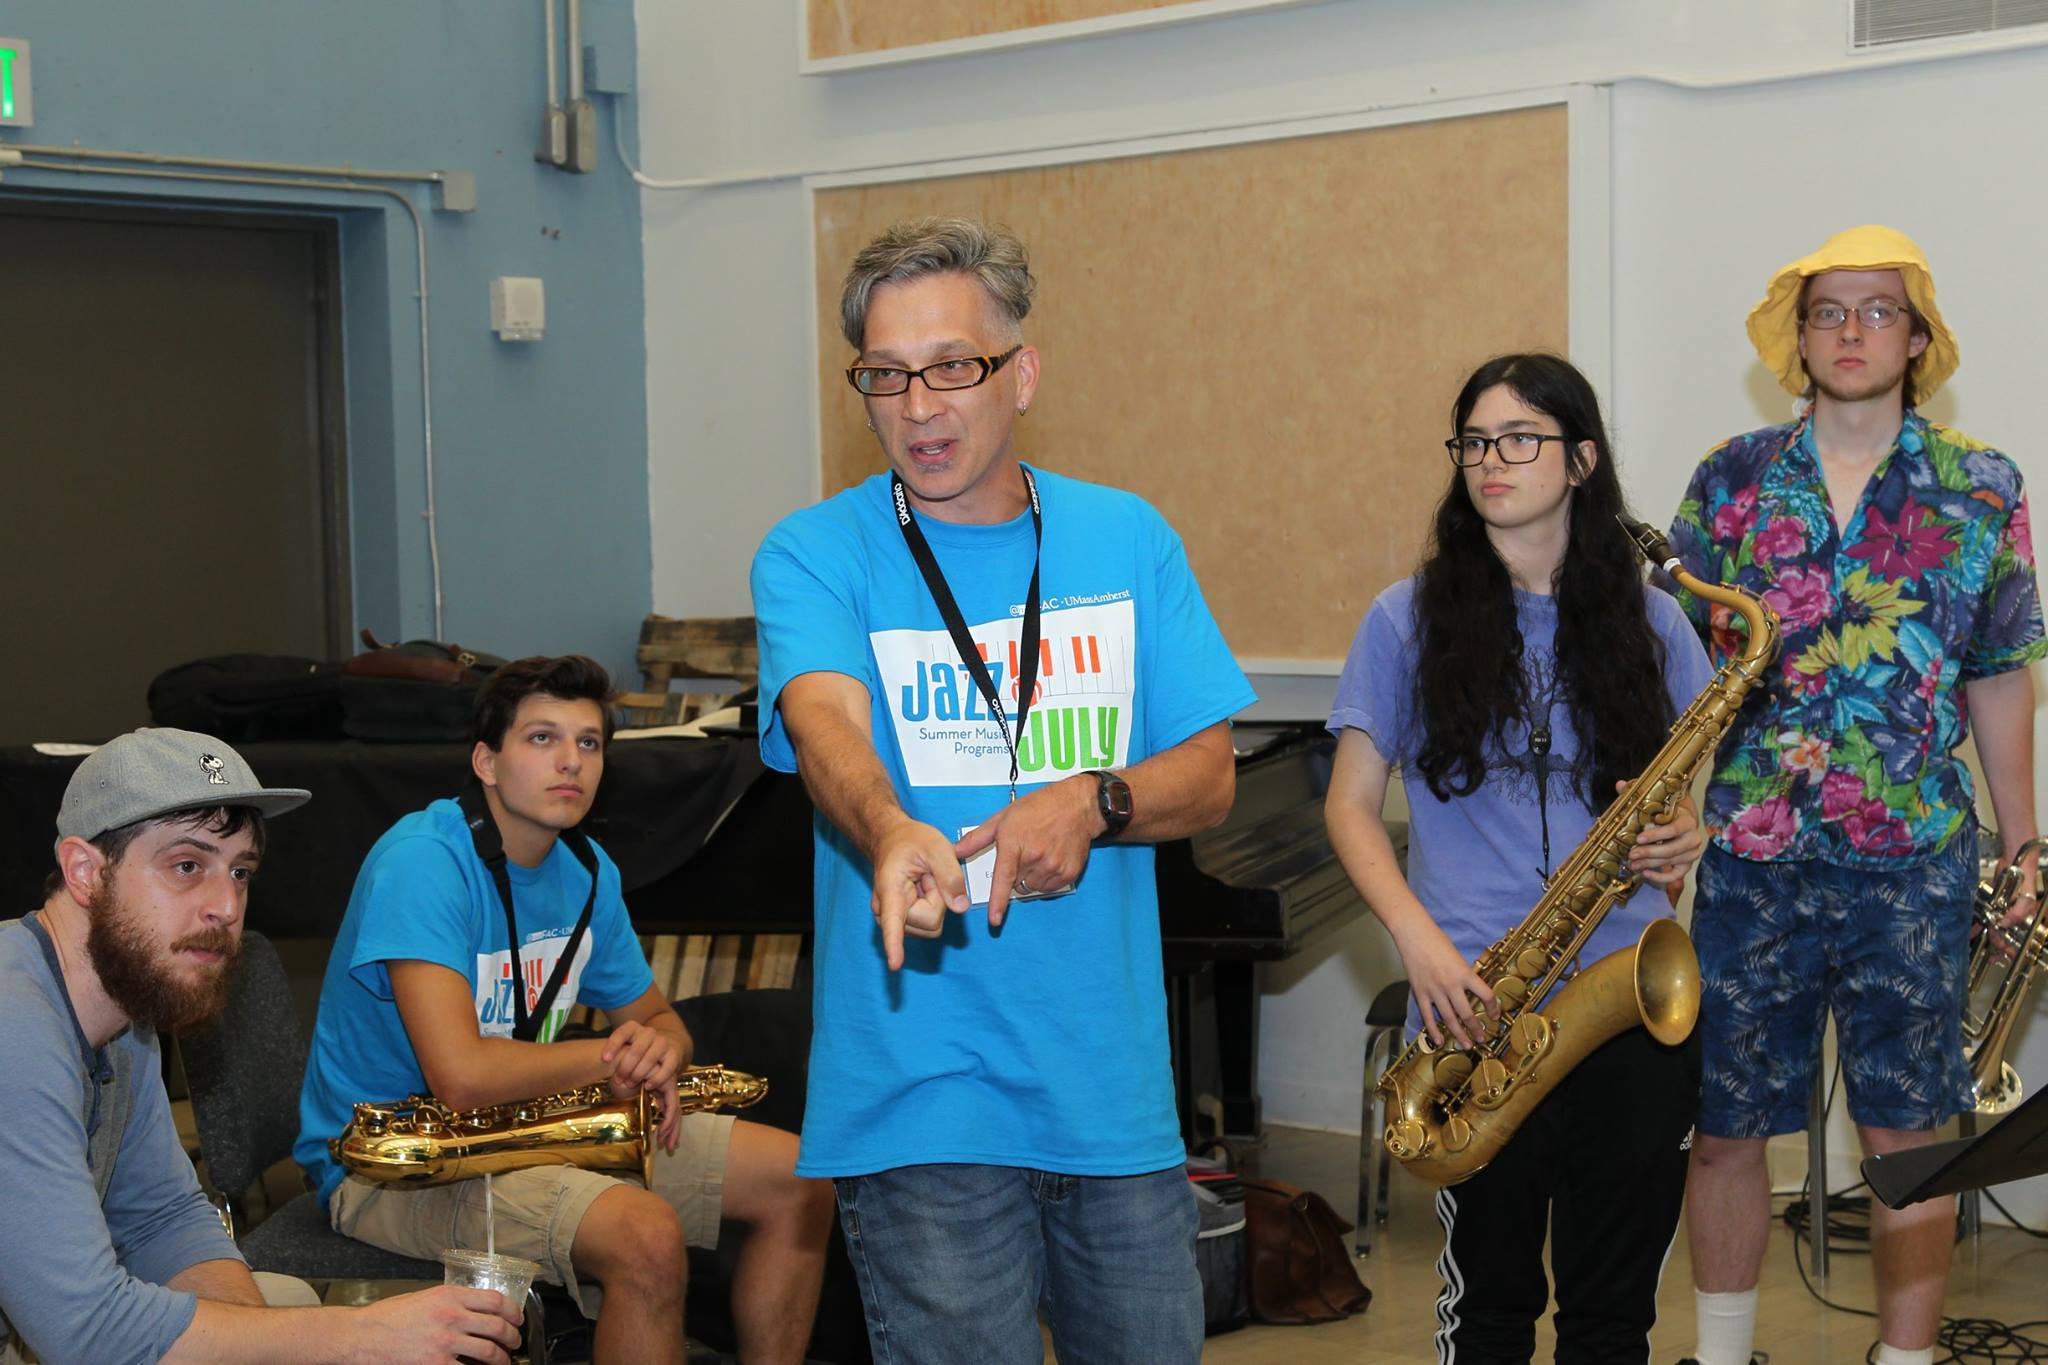 Earl MacDonald presents a jazz workshop.